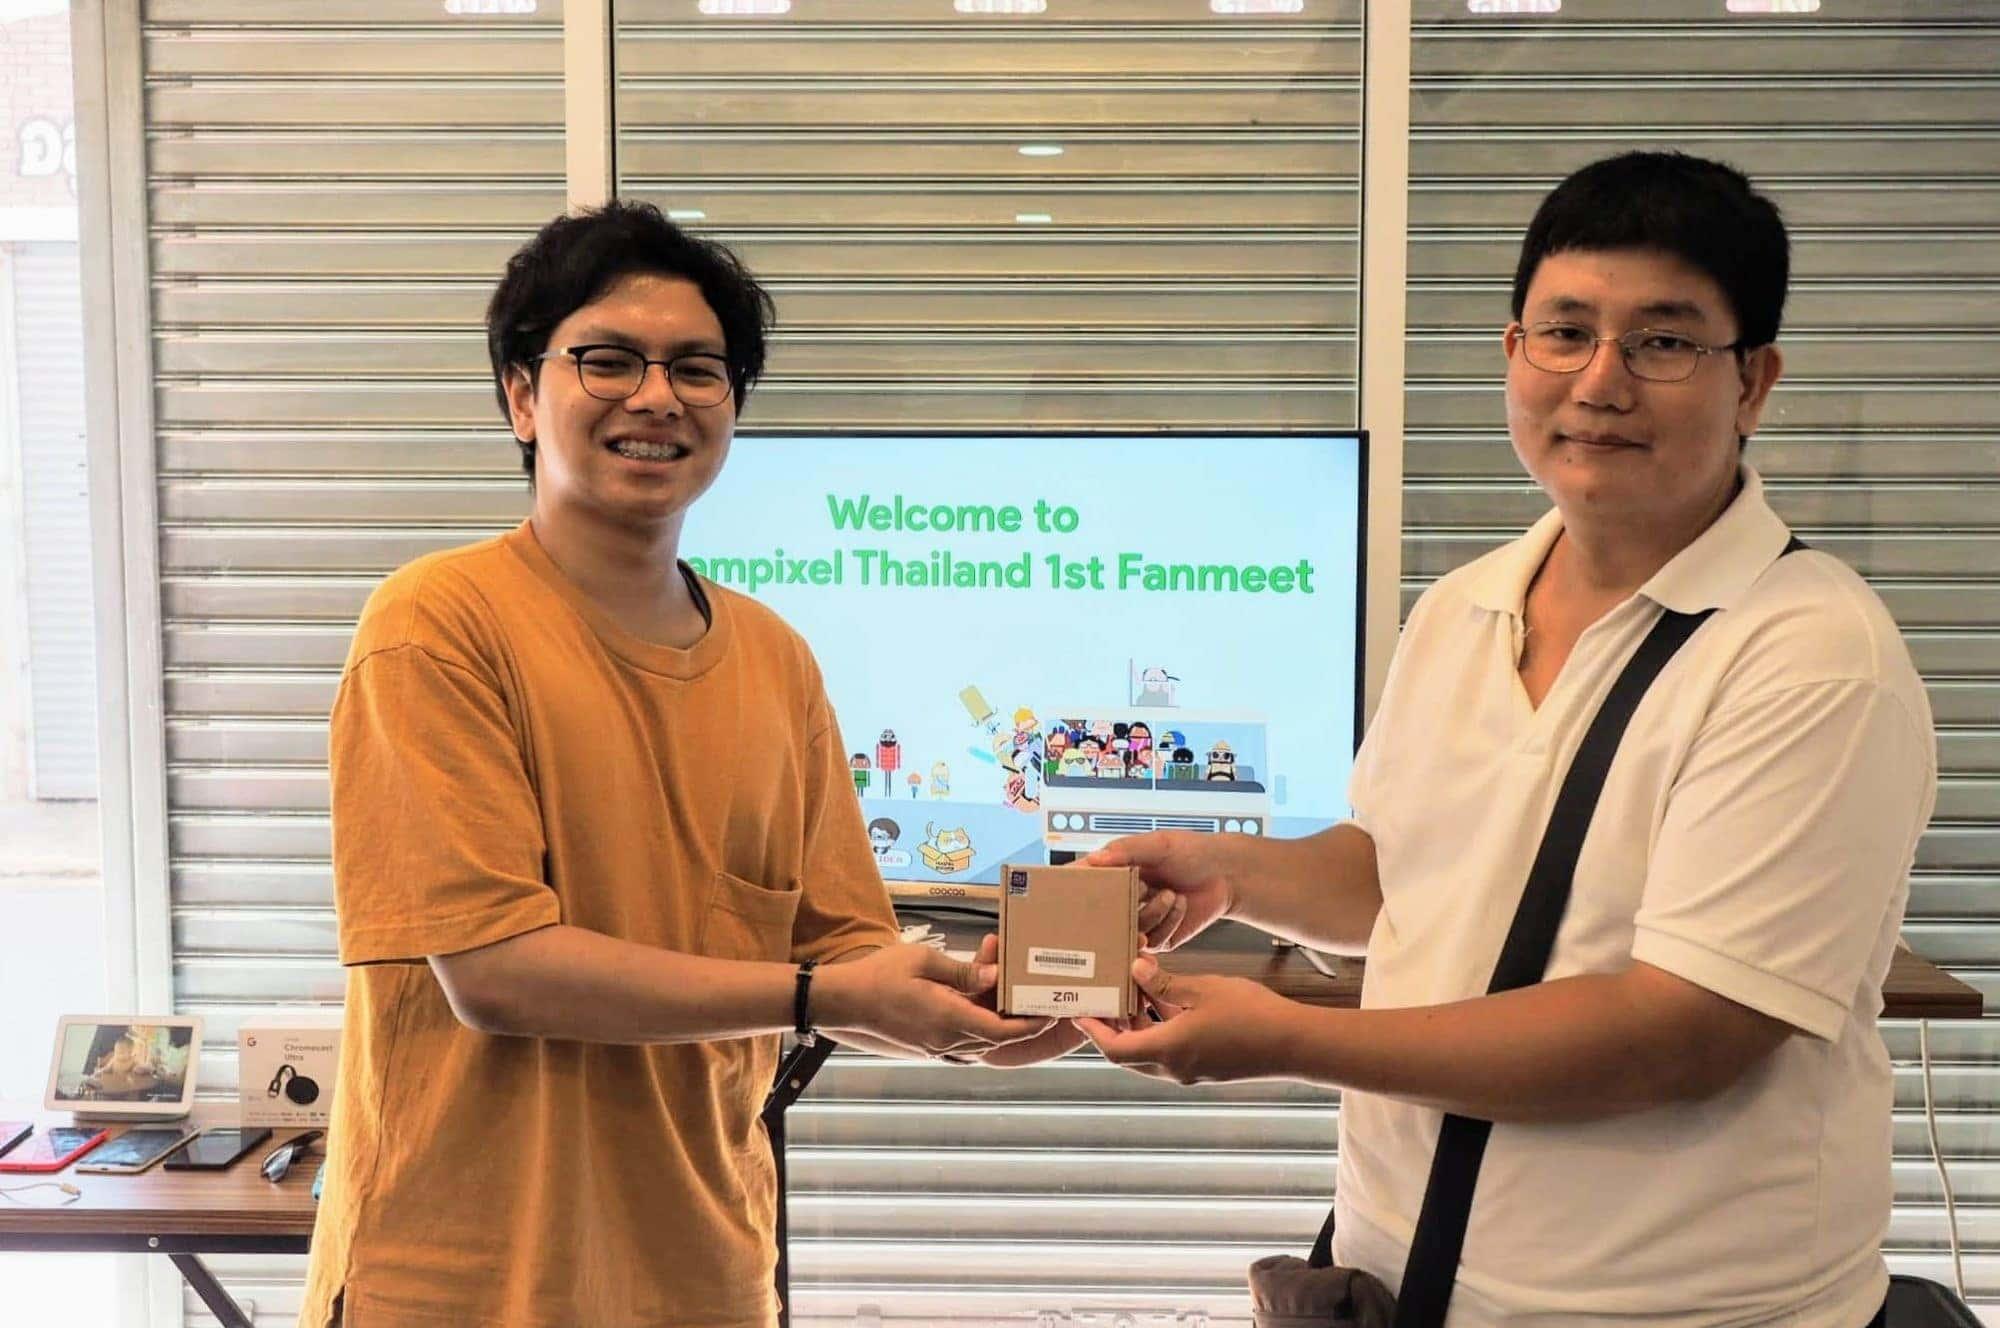 - #teampixel Thailand 1st Fanmeet ครั้งแรกของงานมีตติ้งผู้ชื่นชอบ Google Pixel ณ NuaNia Creative Space